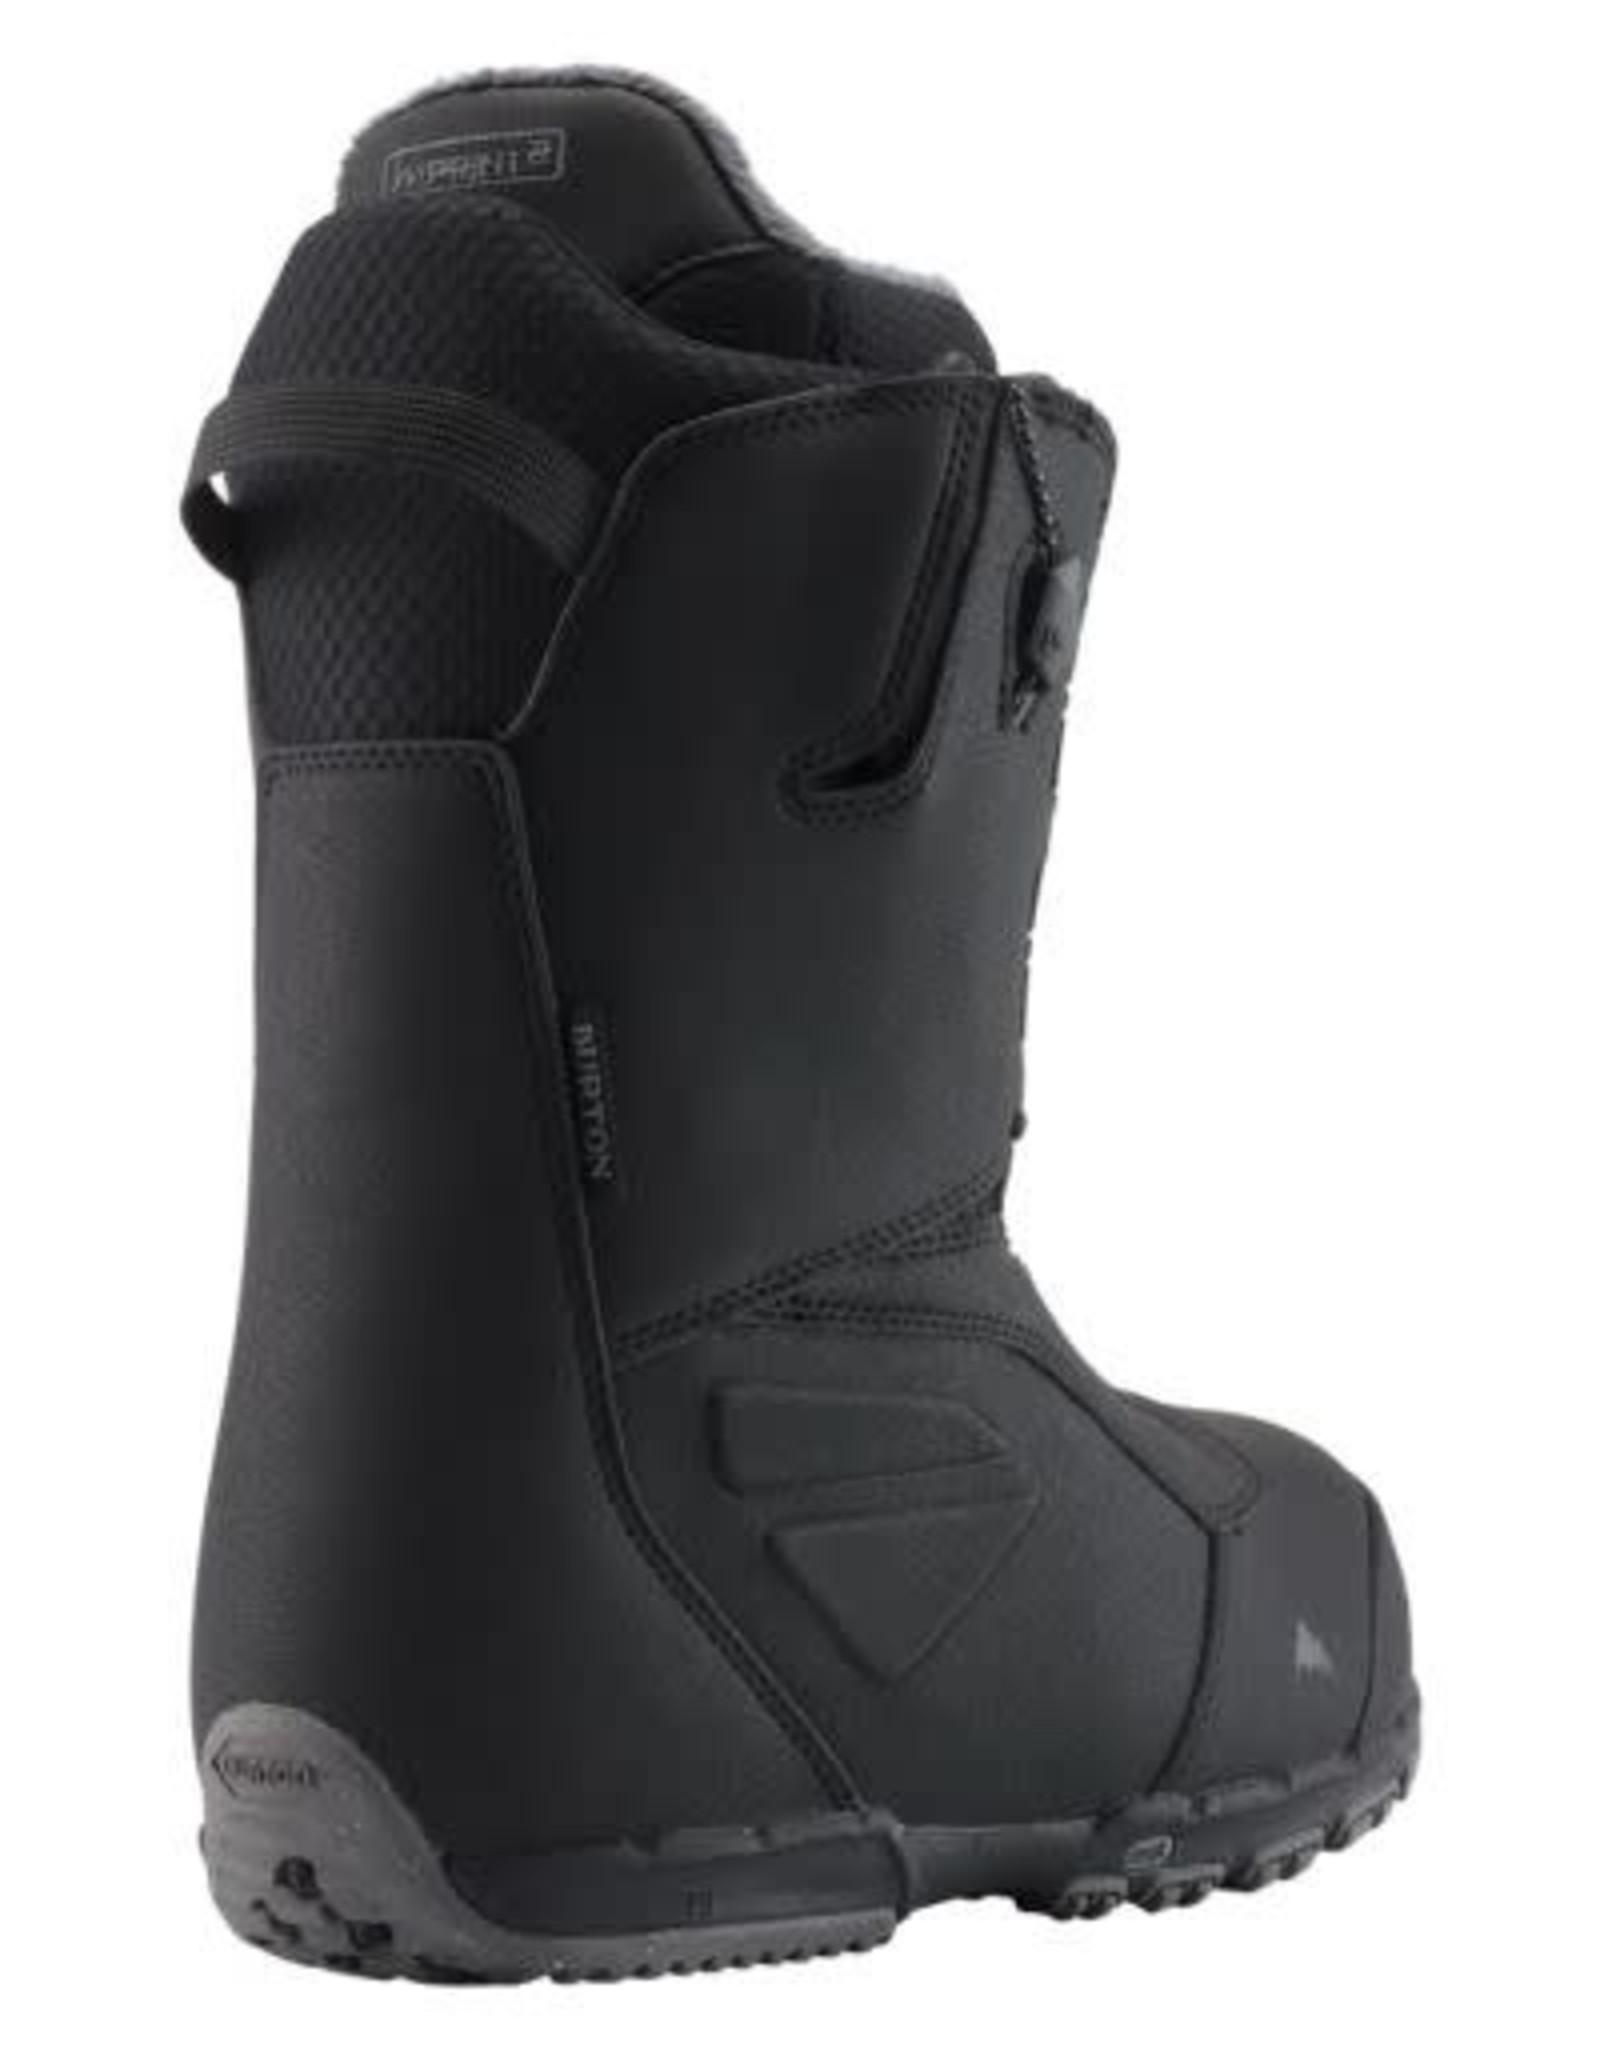 Burton Men's Ruler Snowboard Boot